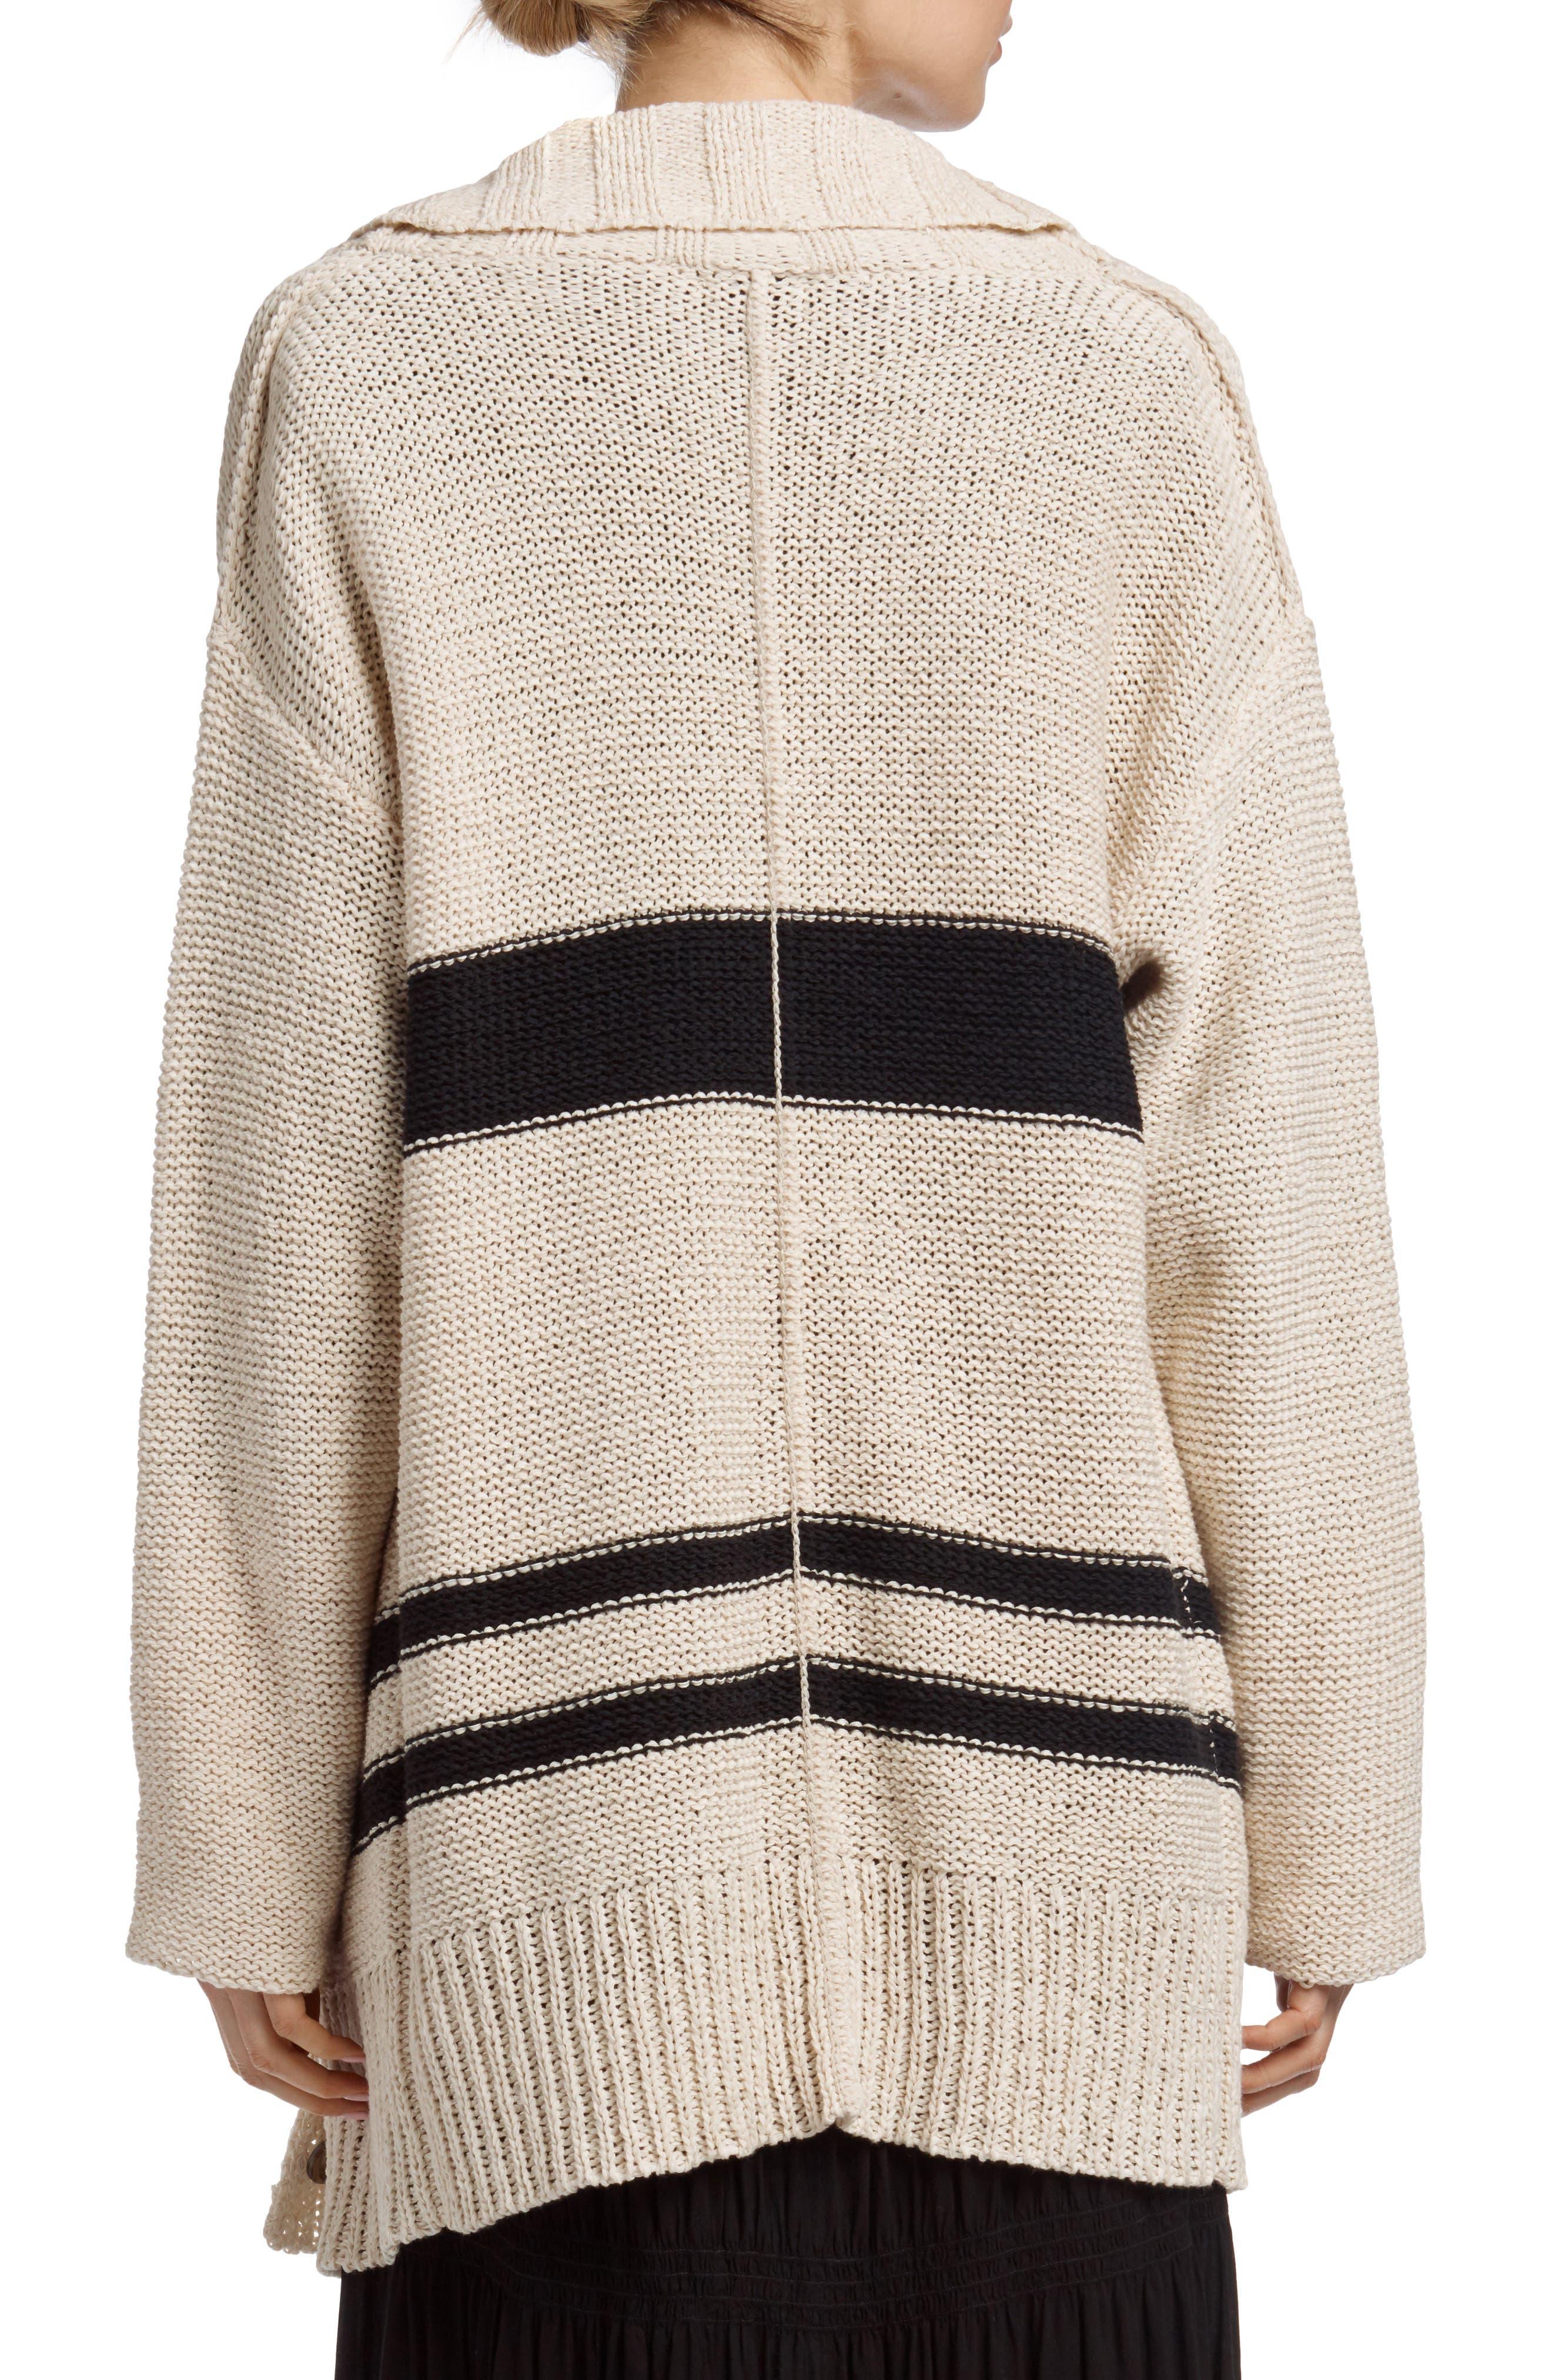 Alternate Image 2  - James Perse Cotton & Linen Blend Beach Sweater